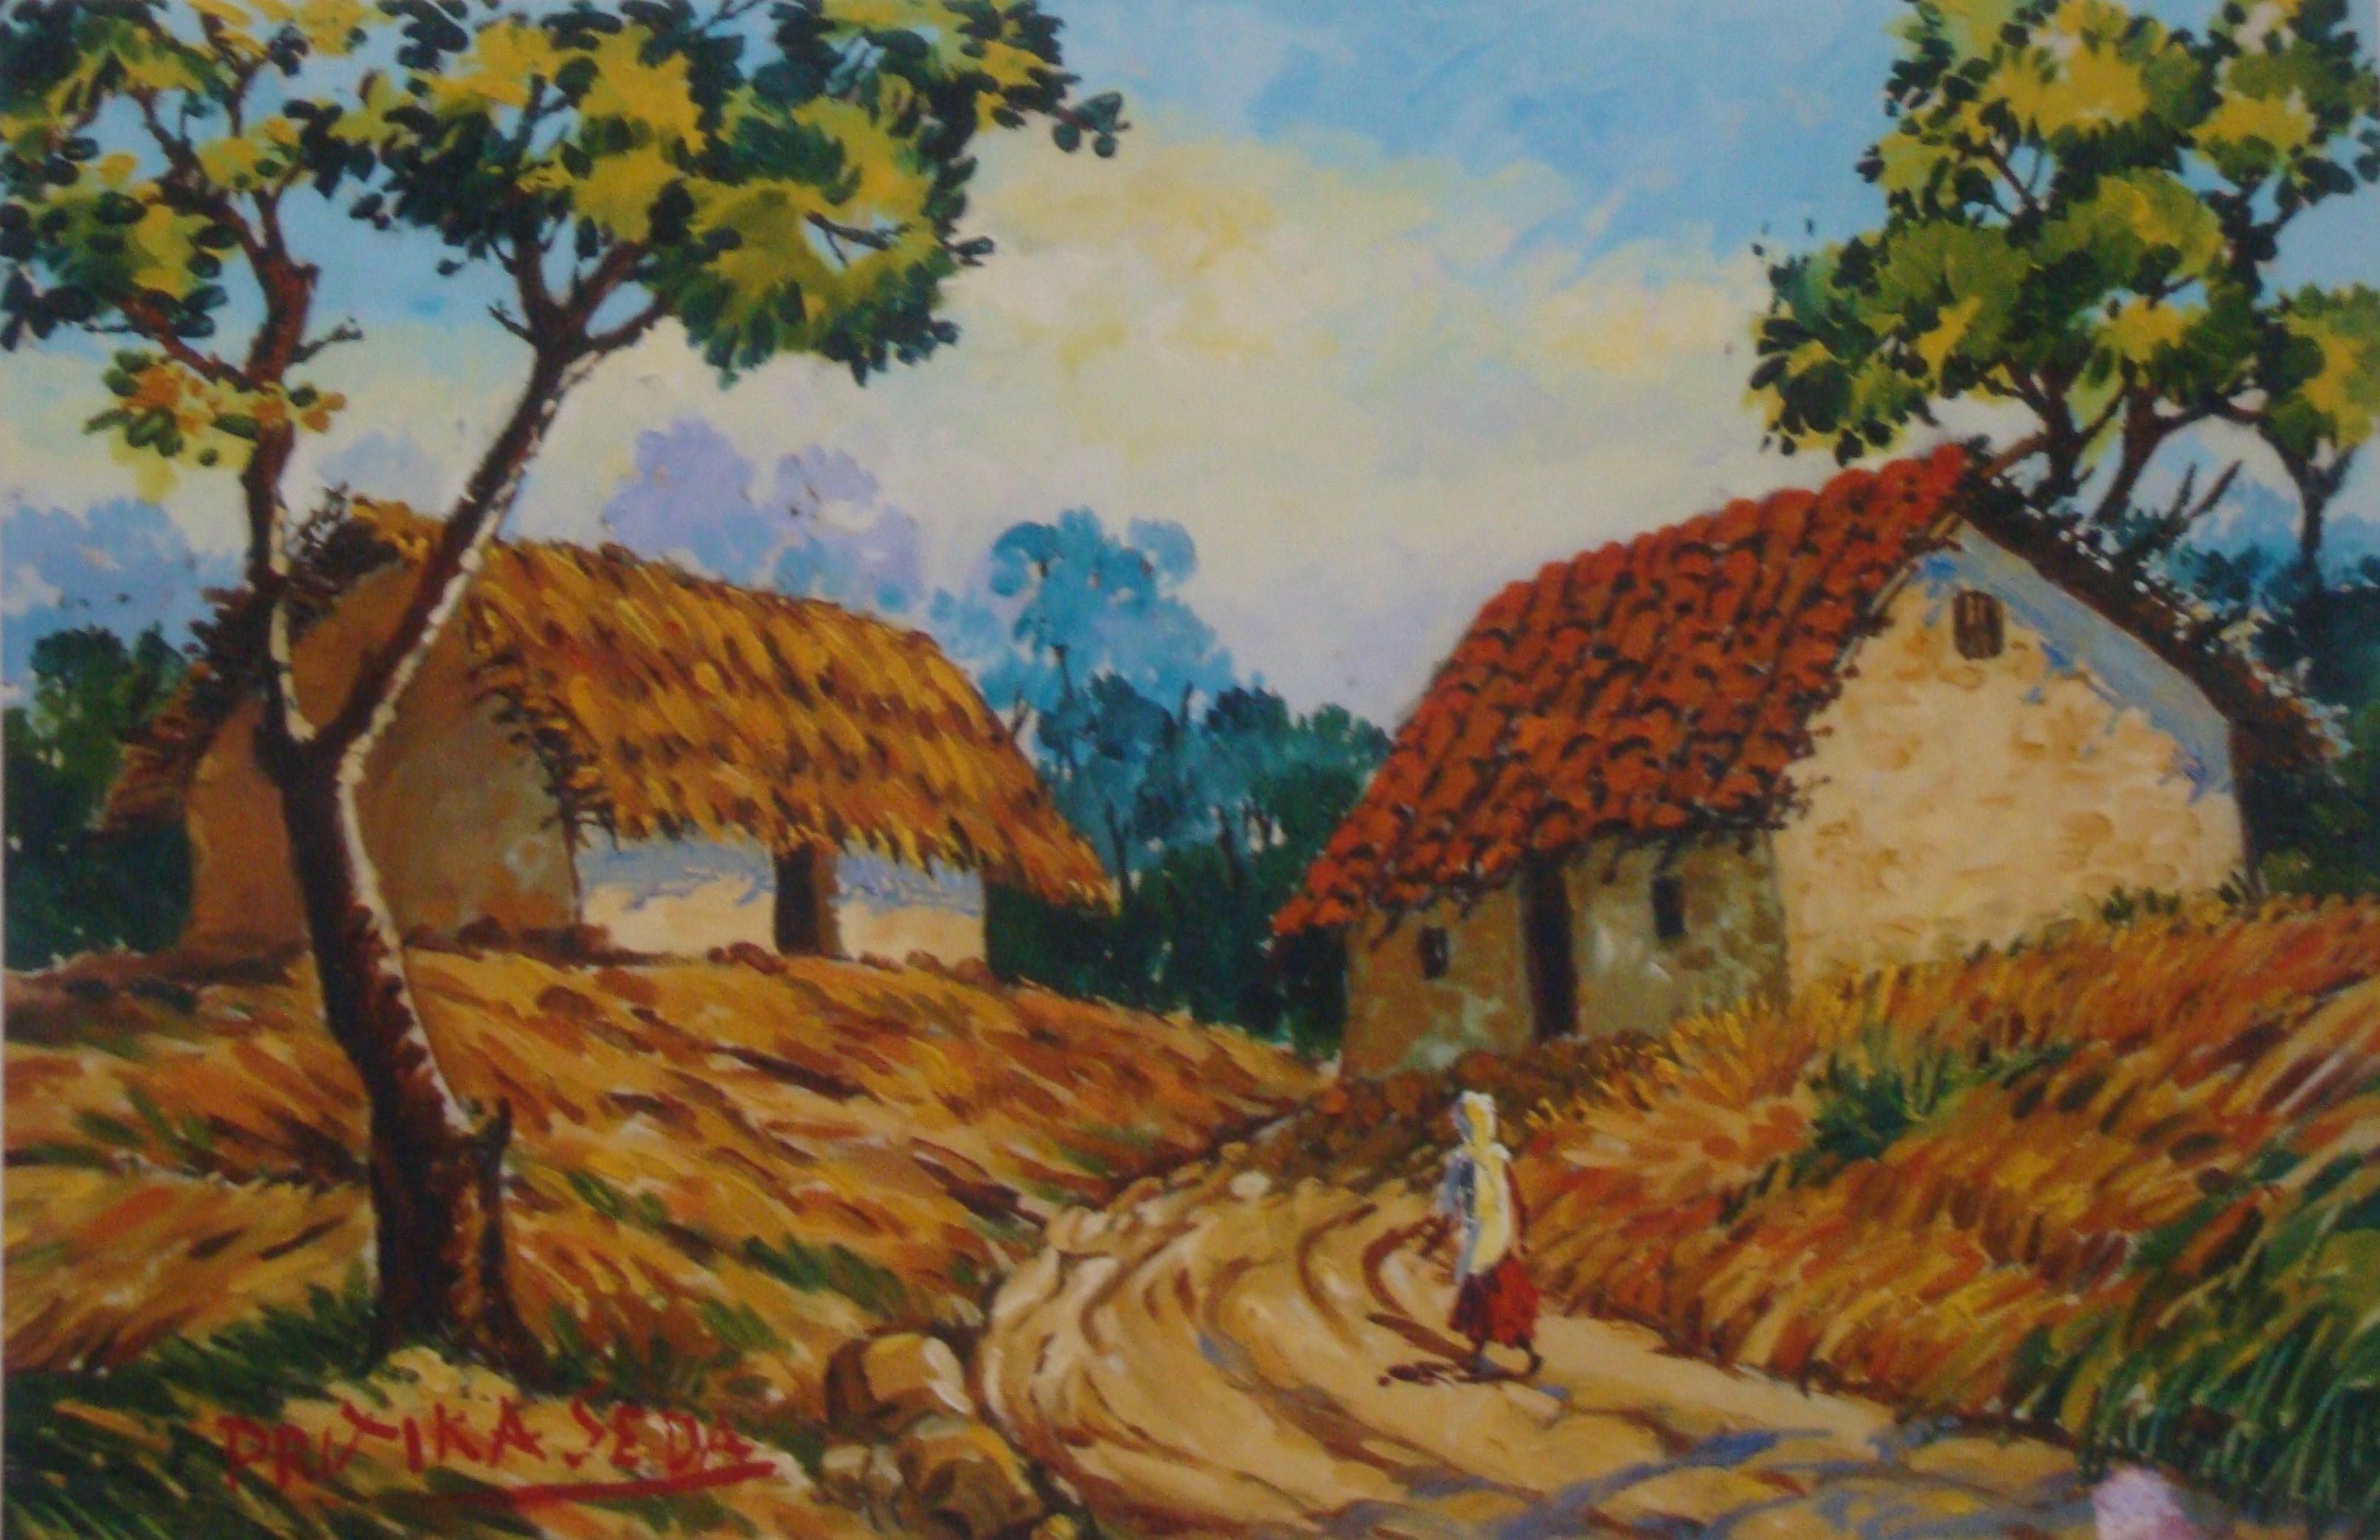 VILLAGE LANDSCAPE by PRITIKA SEDA